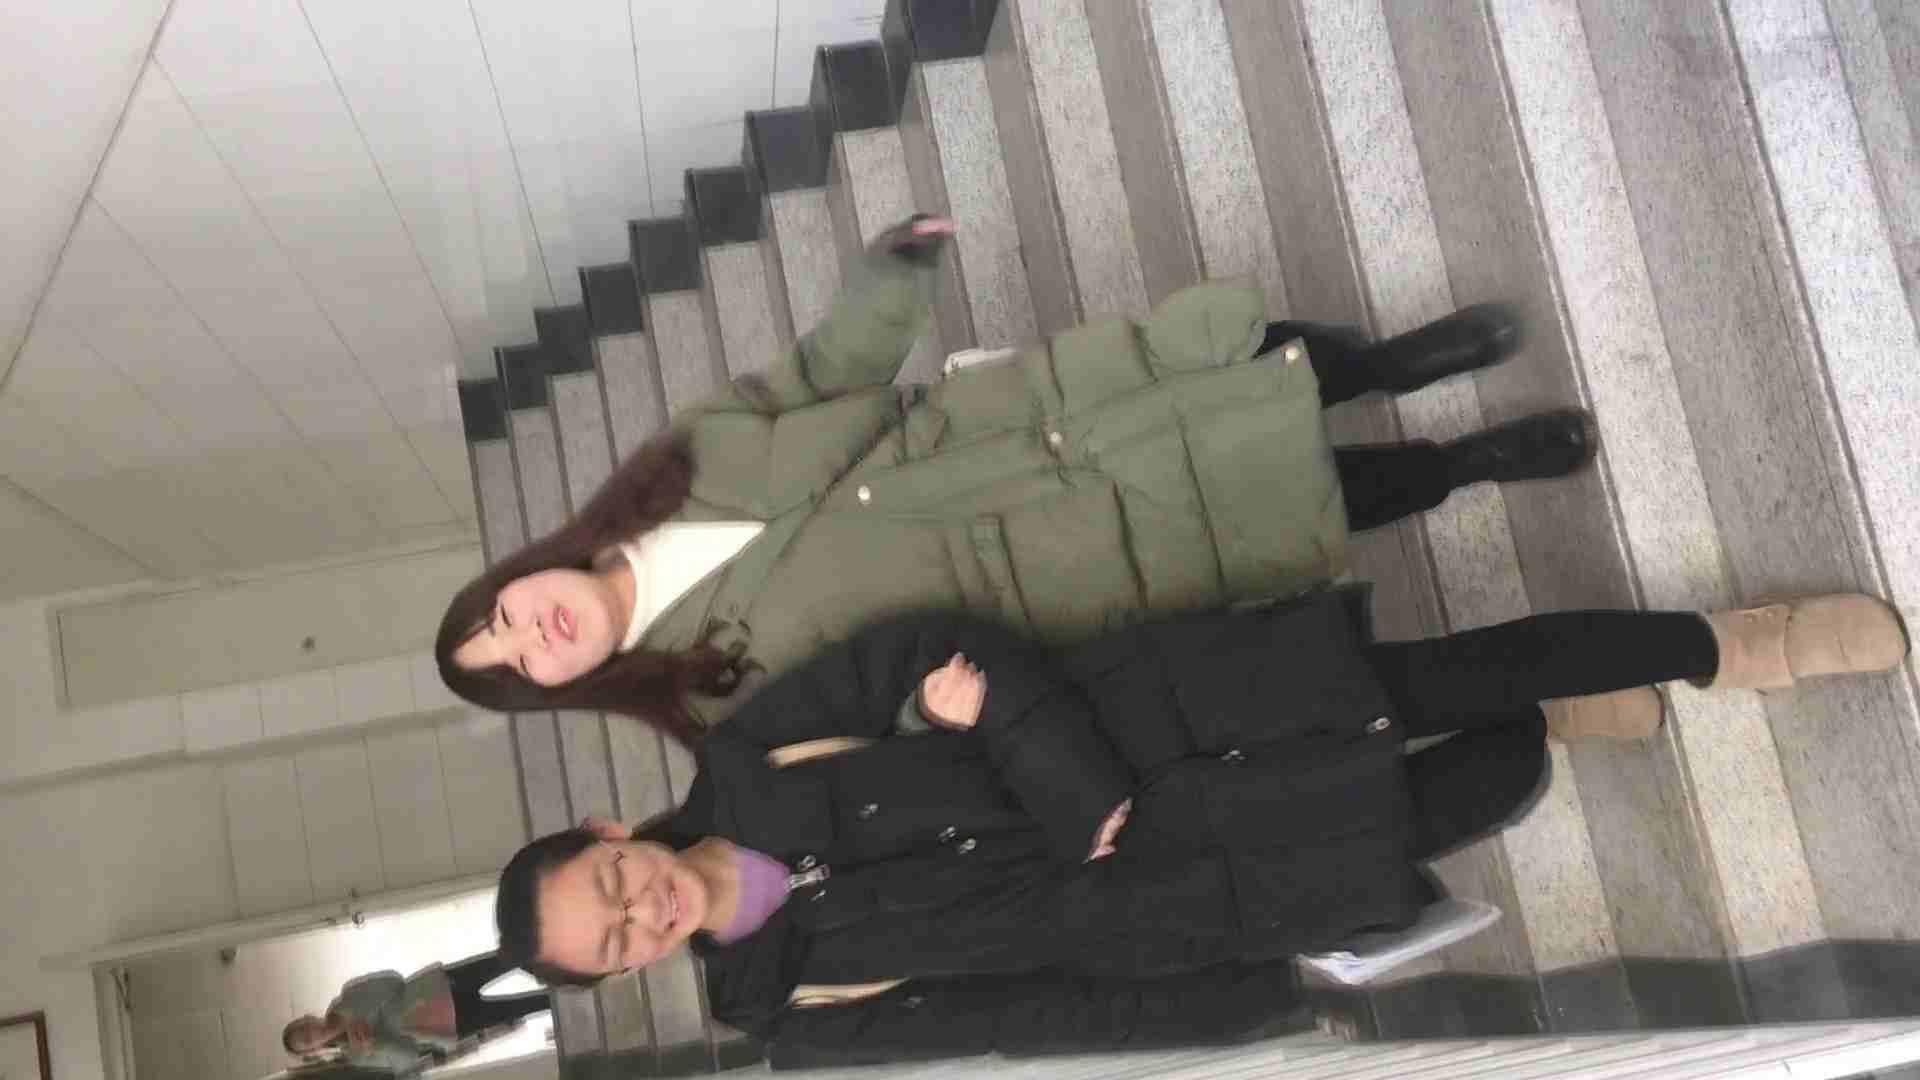 芸術大学ガチ潜入盗撮 JD盗撮 美女の洗面所の秘密 Vol.90 盗撮・必見 エロ画像 35画像 7